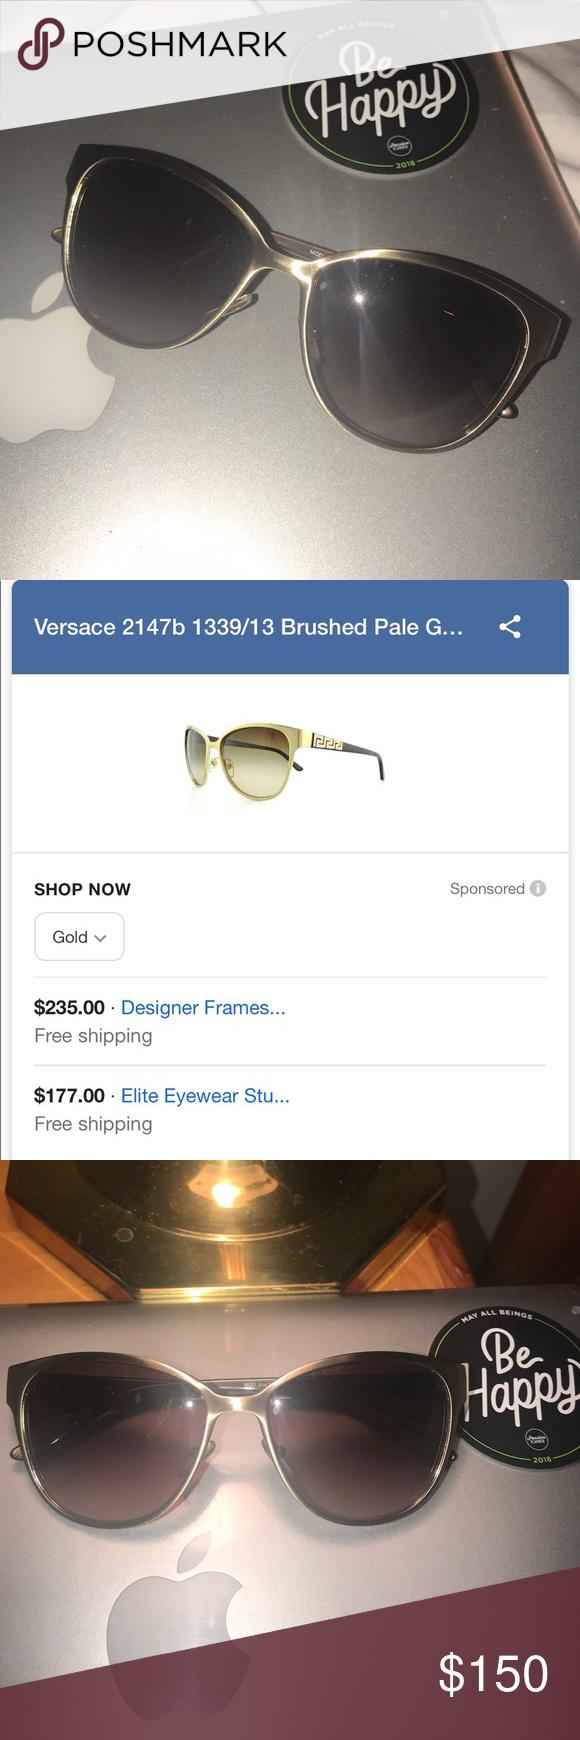 27b97e6003 Gold Versace Sunglasses Authentic. Excellent condition. No scratches. No  case. 🌸 Color  Brushed pale gold Versace Accessories Sunglasses